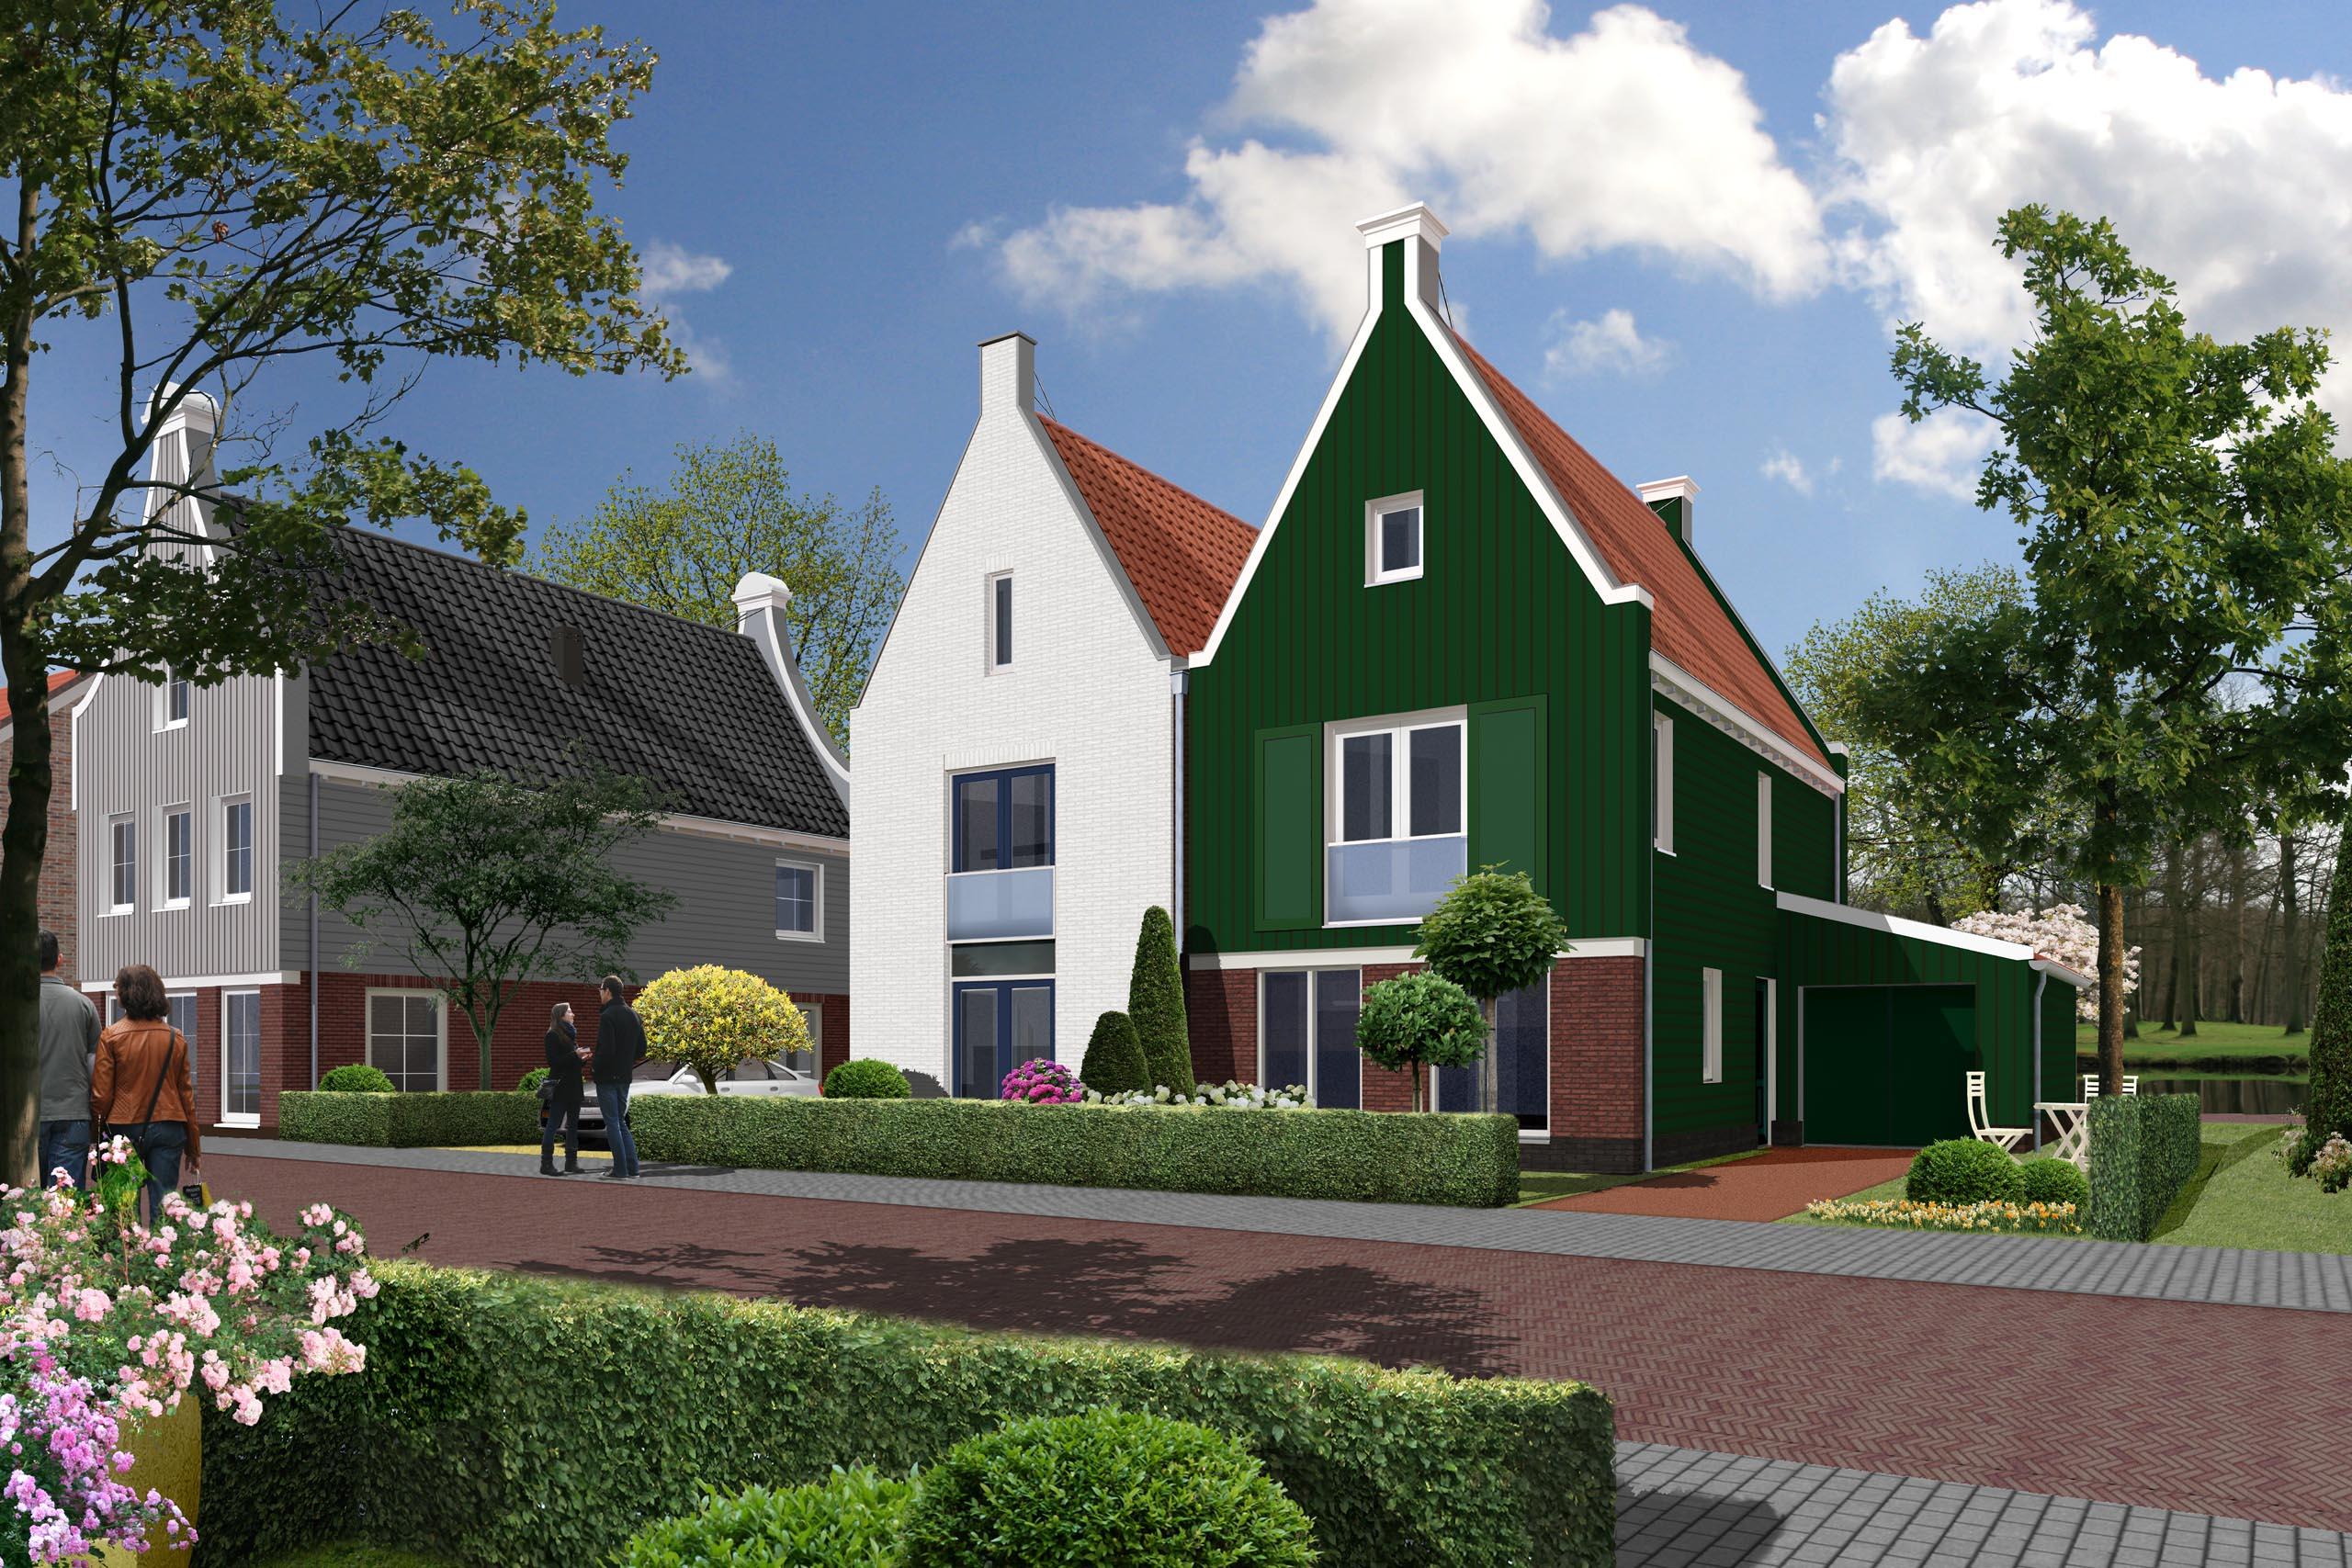 woningbouw woningen De Pauw de Rijp dorps bouwen architect Ton van 't Hoff architectuur